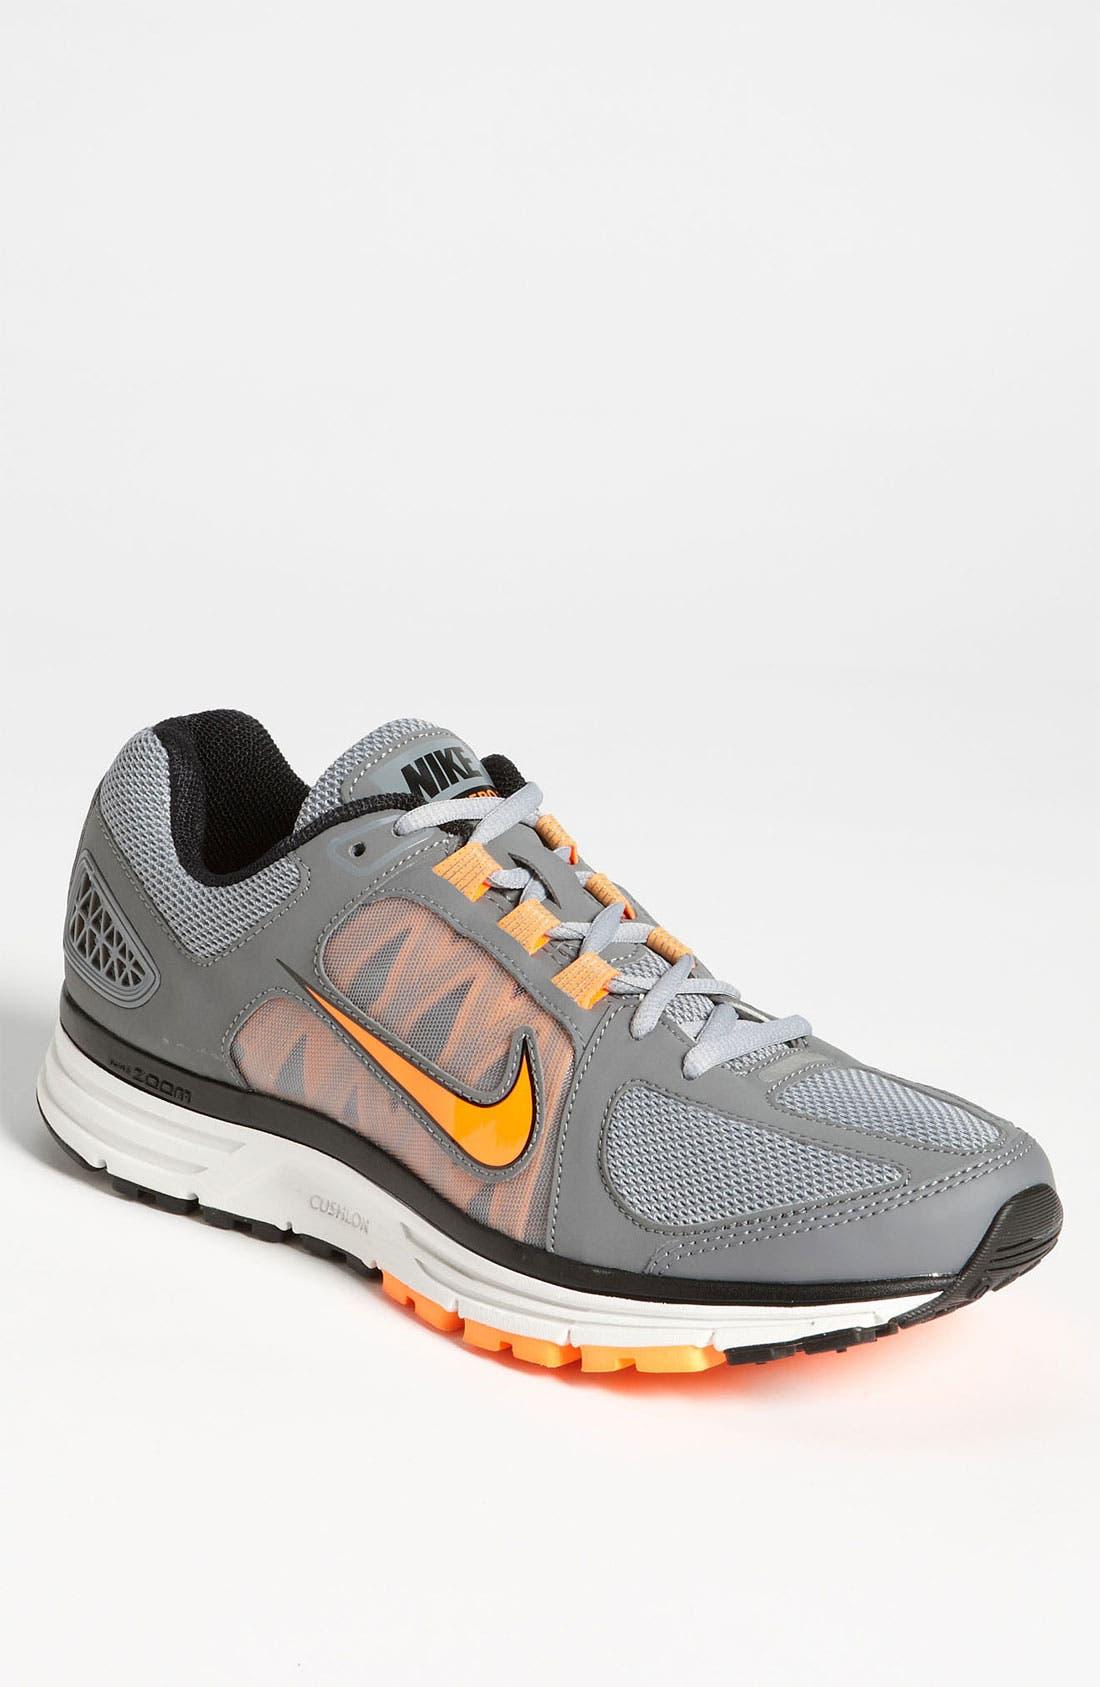 Alternate Image 1 Selected - Nike 'Zoom Vomero+ 7' Running Shoe (Men)